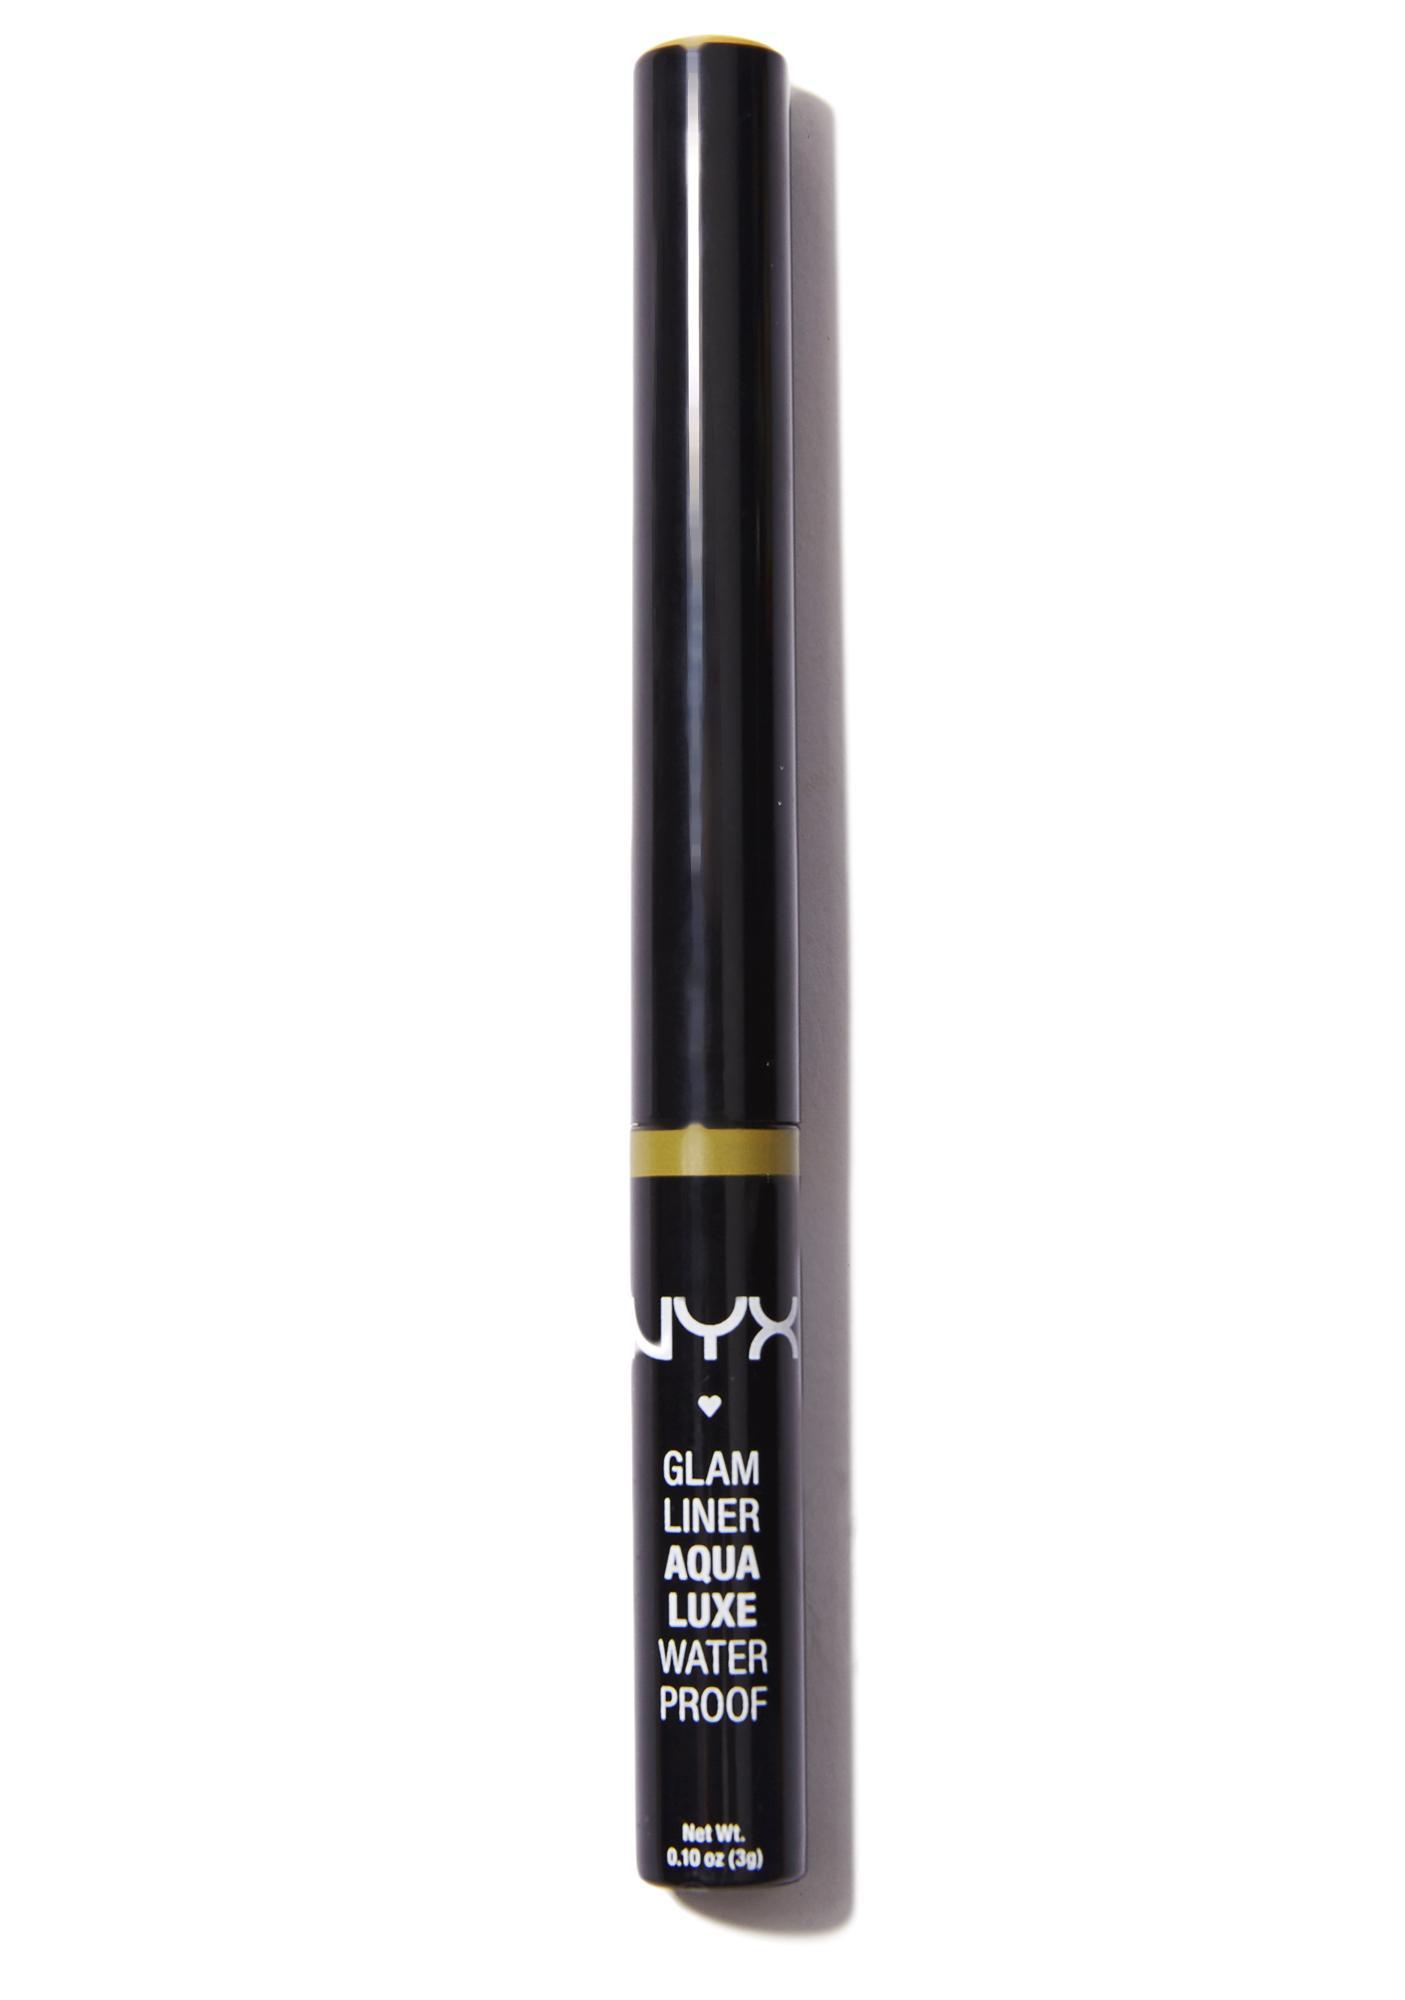 NYX  24 Karat Aqua Luxe Glam Liner